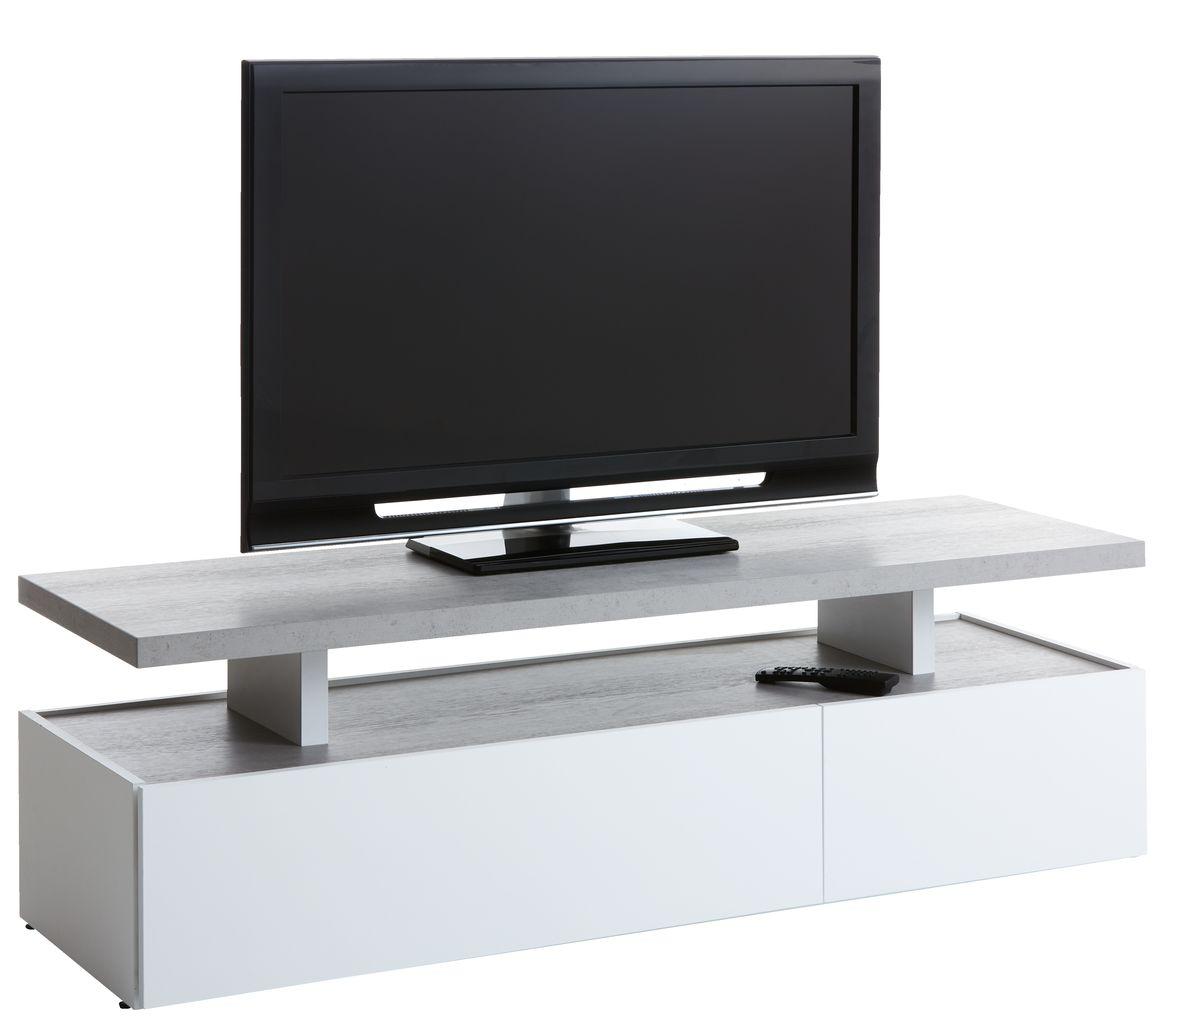 Toftlund Tv bord fra Jysk | FINN.no